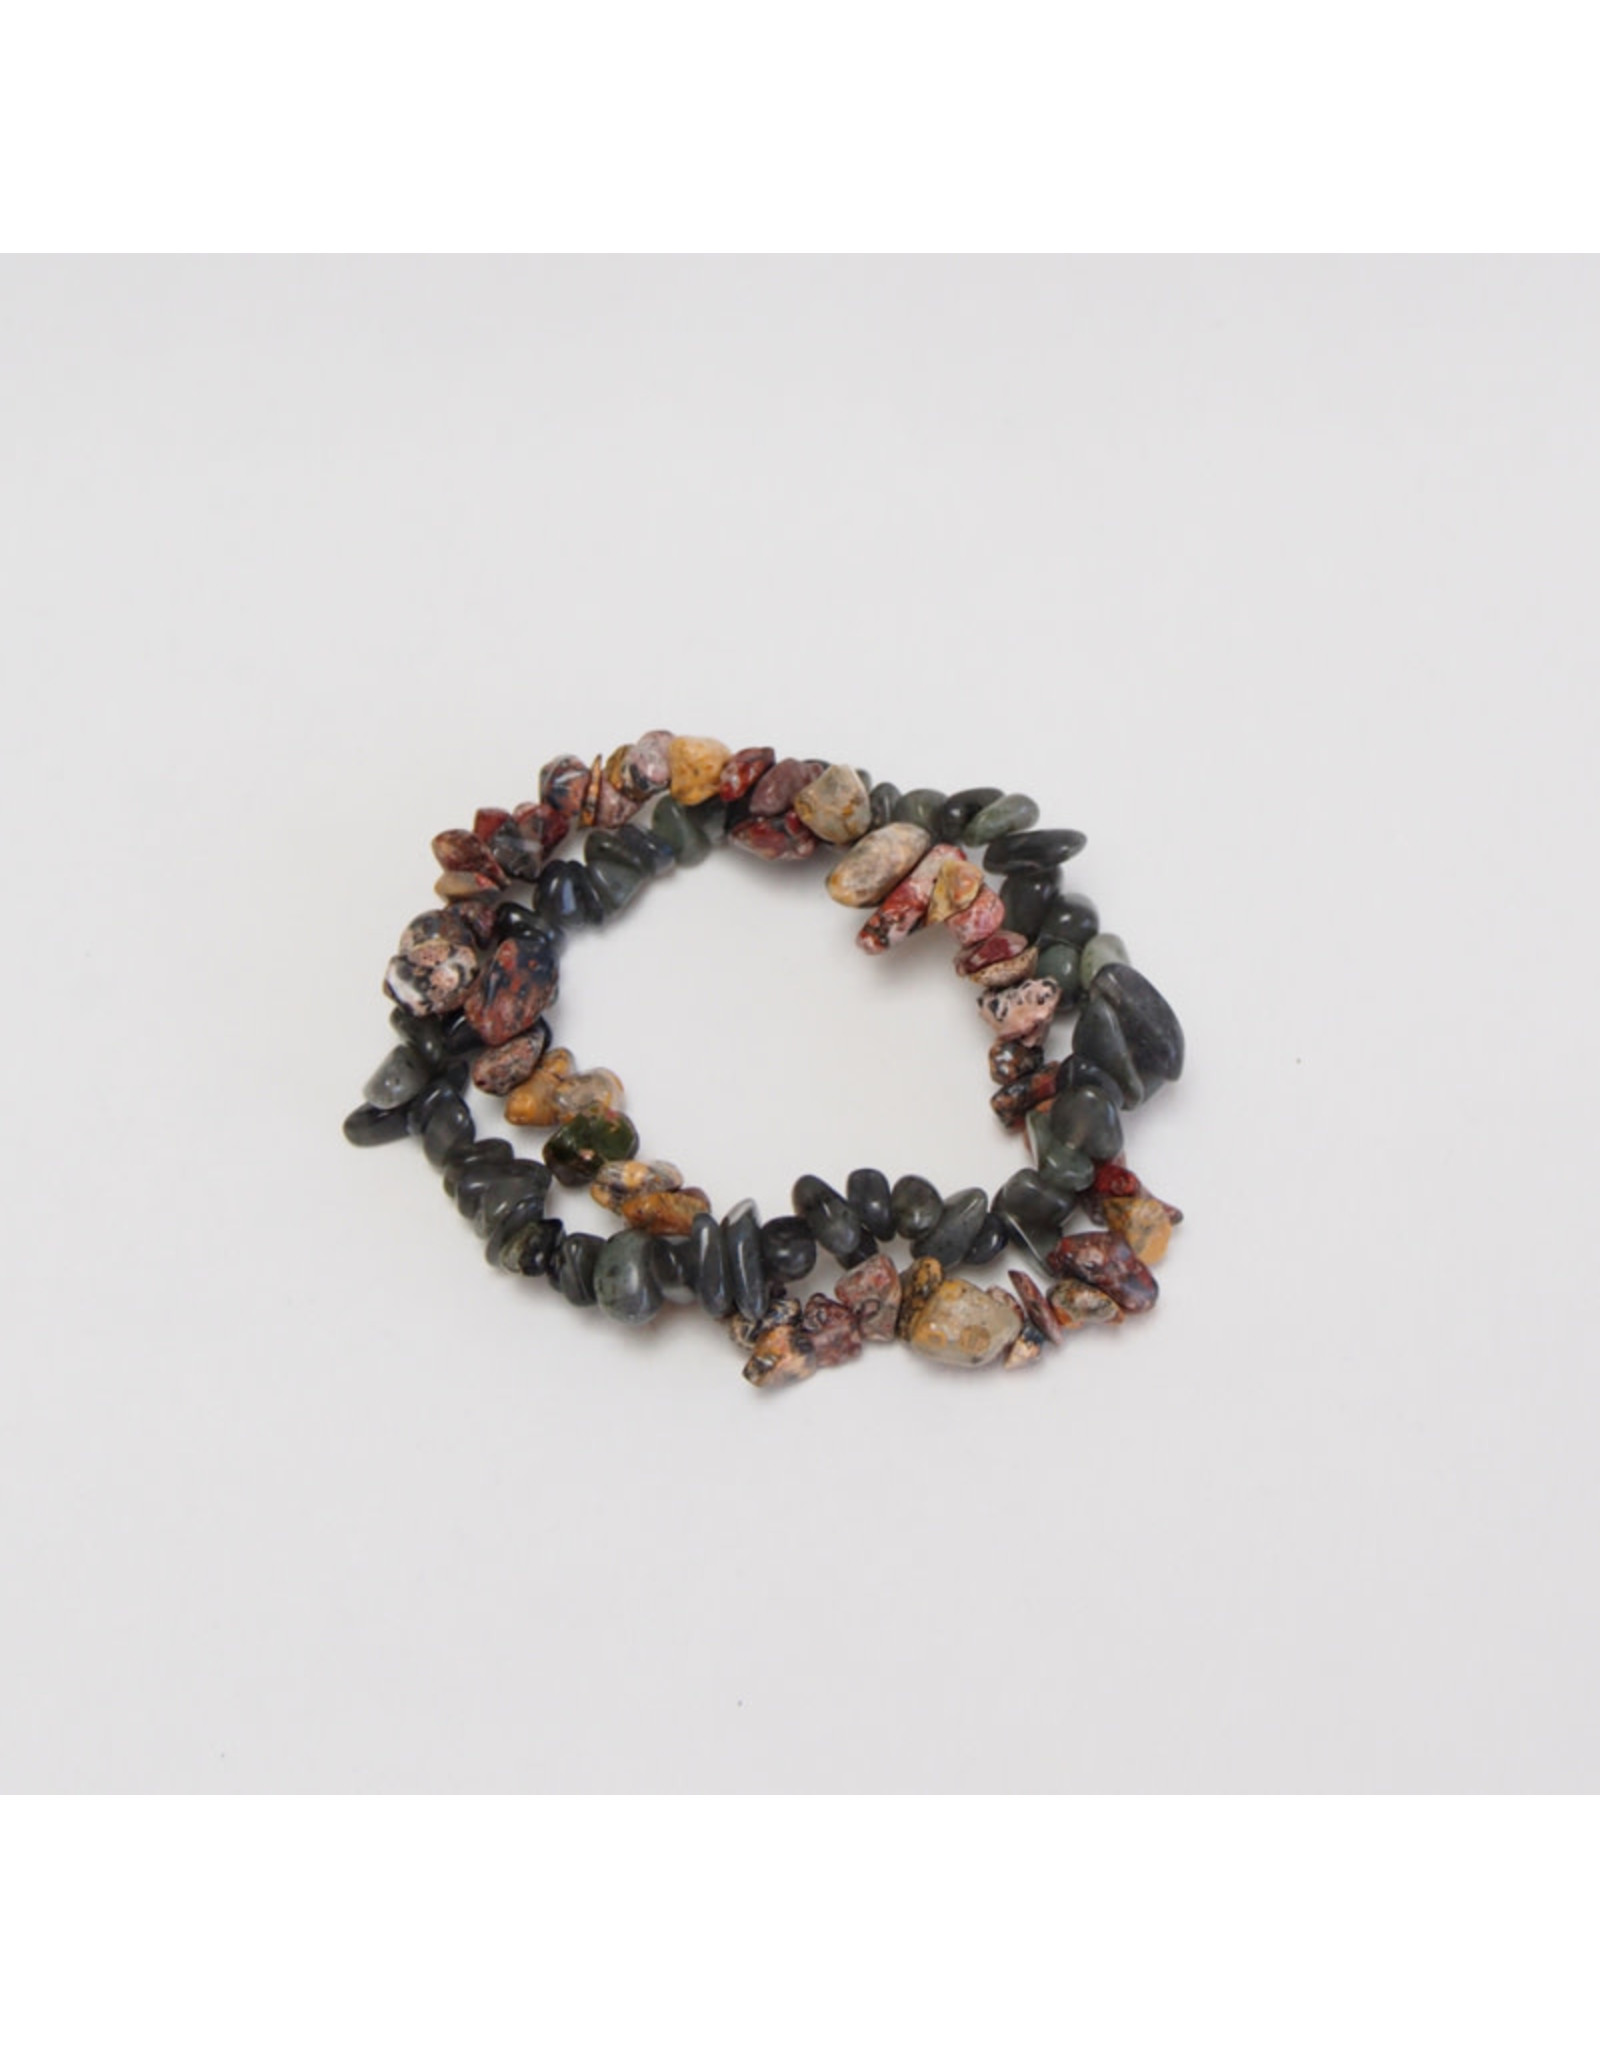 Rockstyle Bracelets - Leopard Jasper & Labradorite